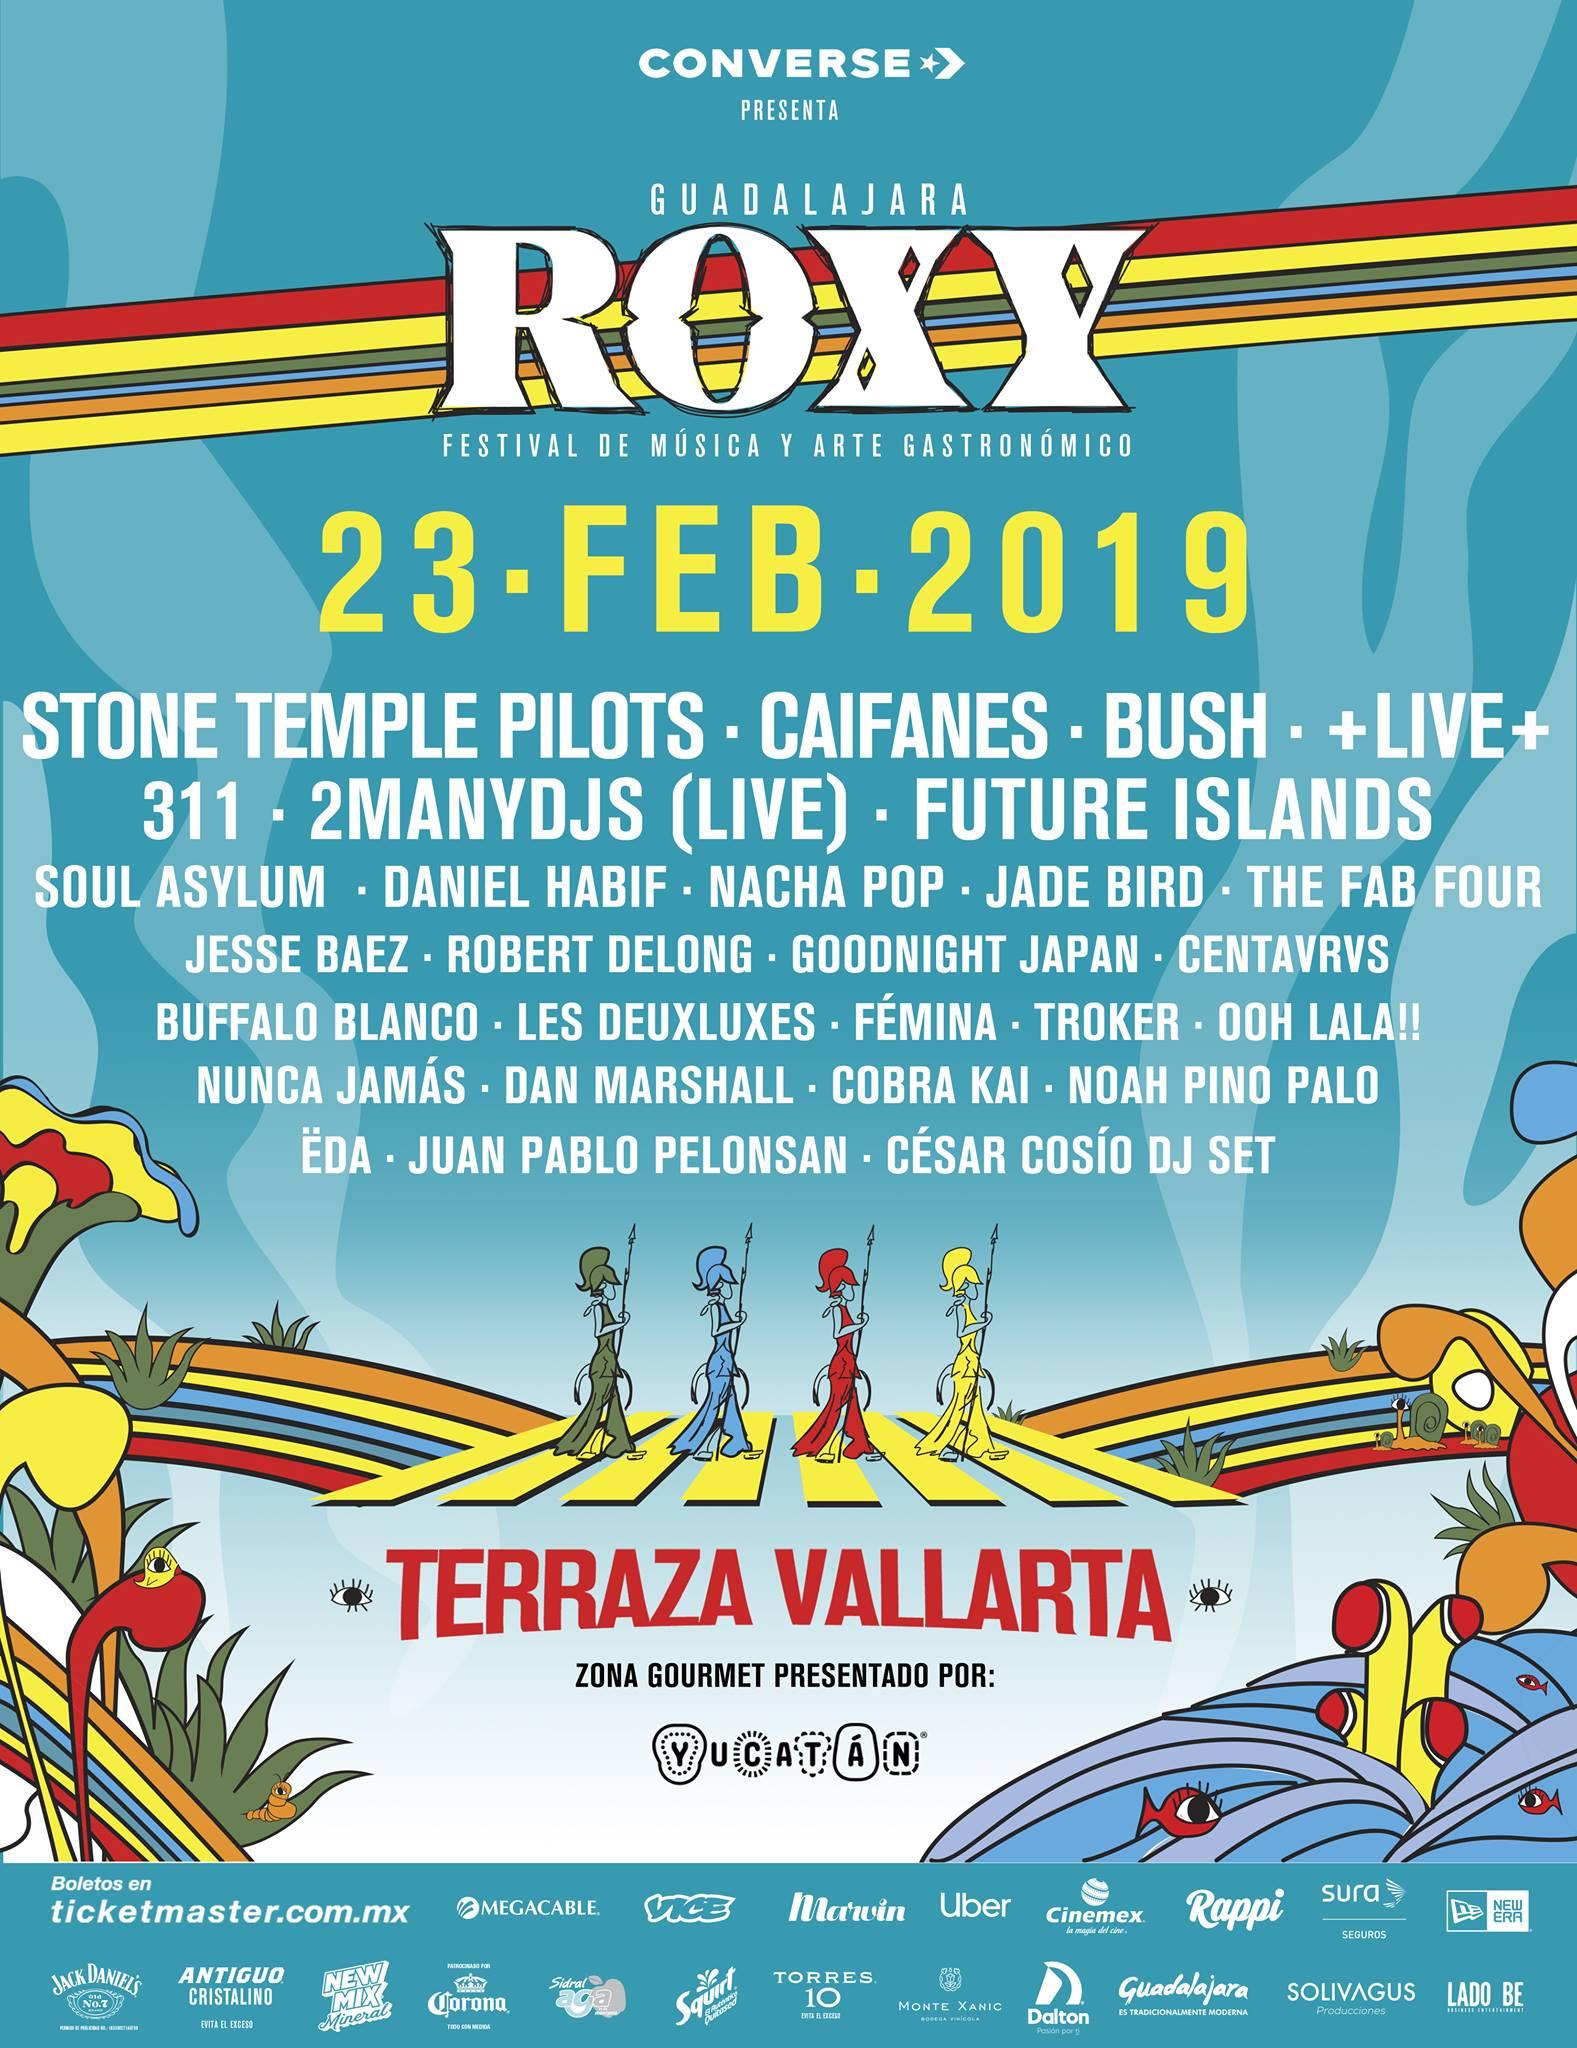 Roxy Fest 2019, 23 de Febrero en Terraza Vallarta